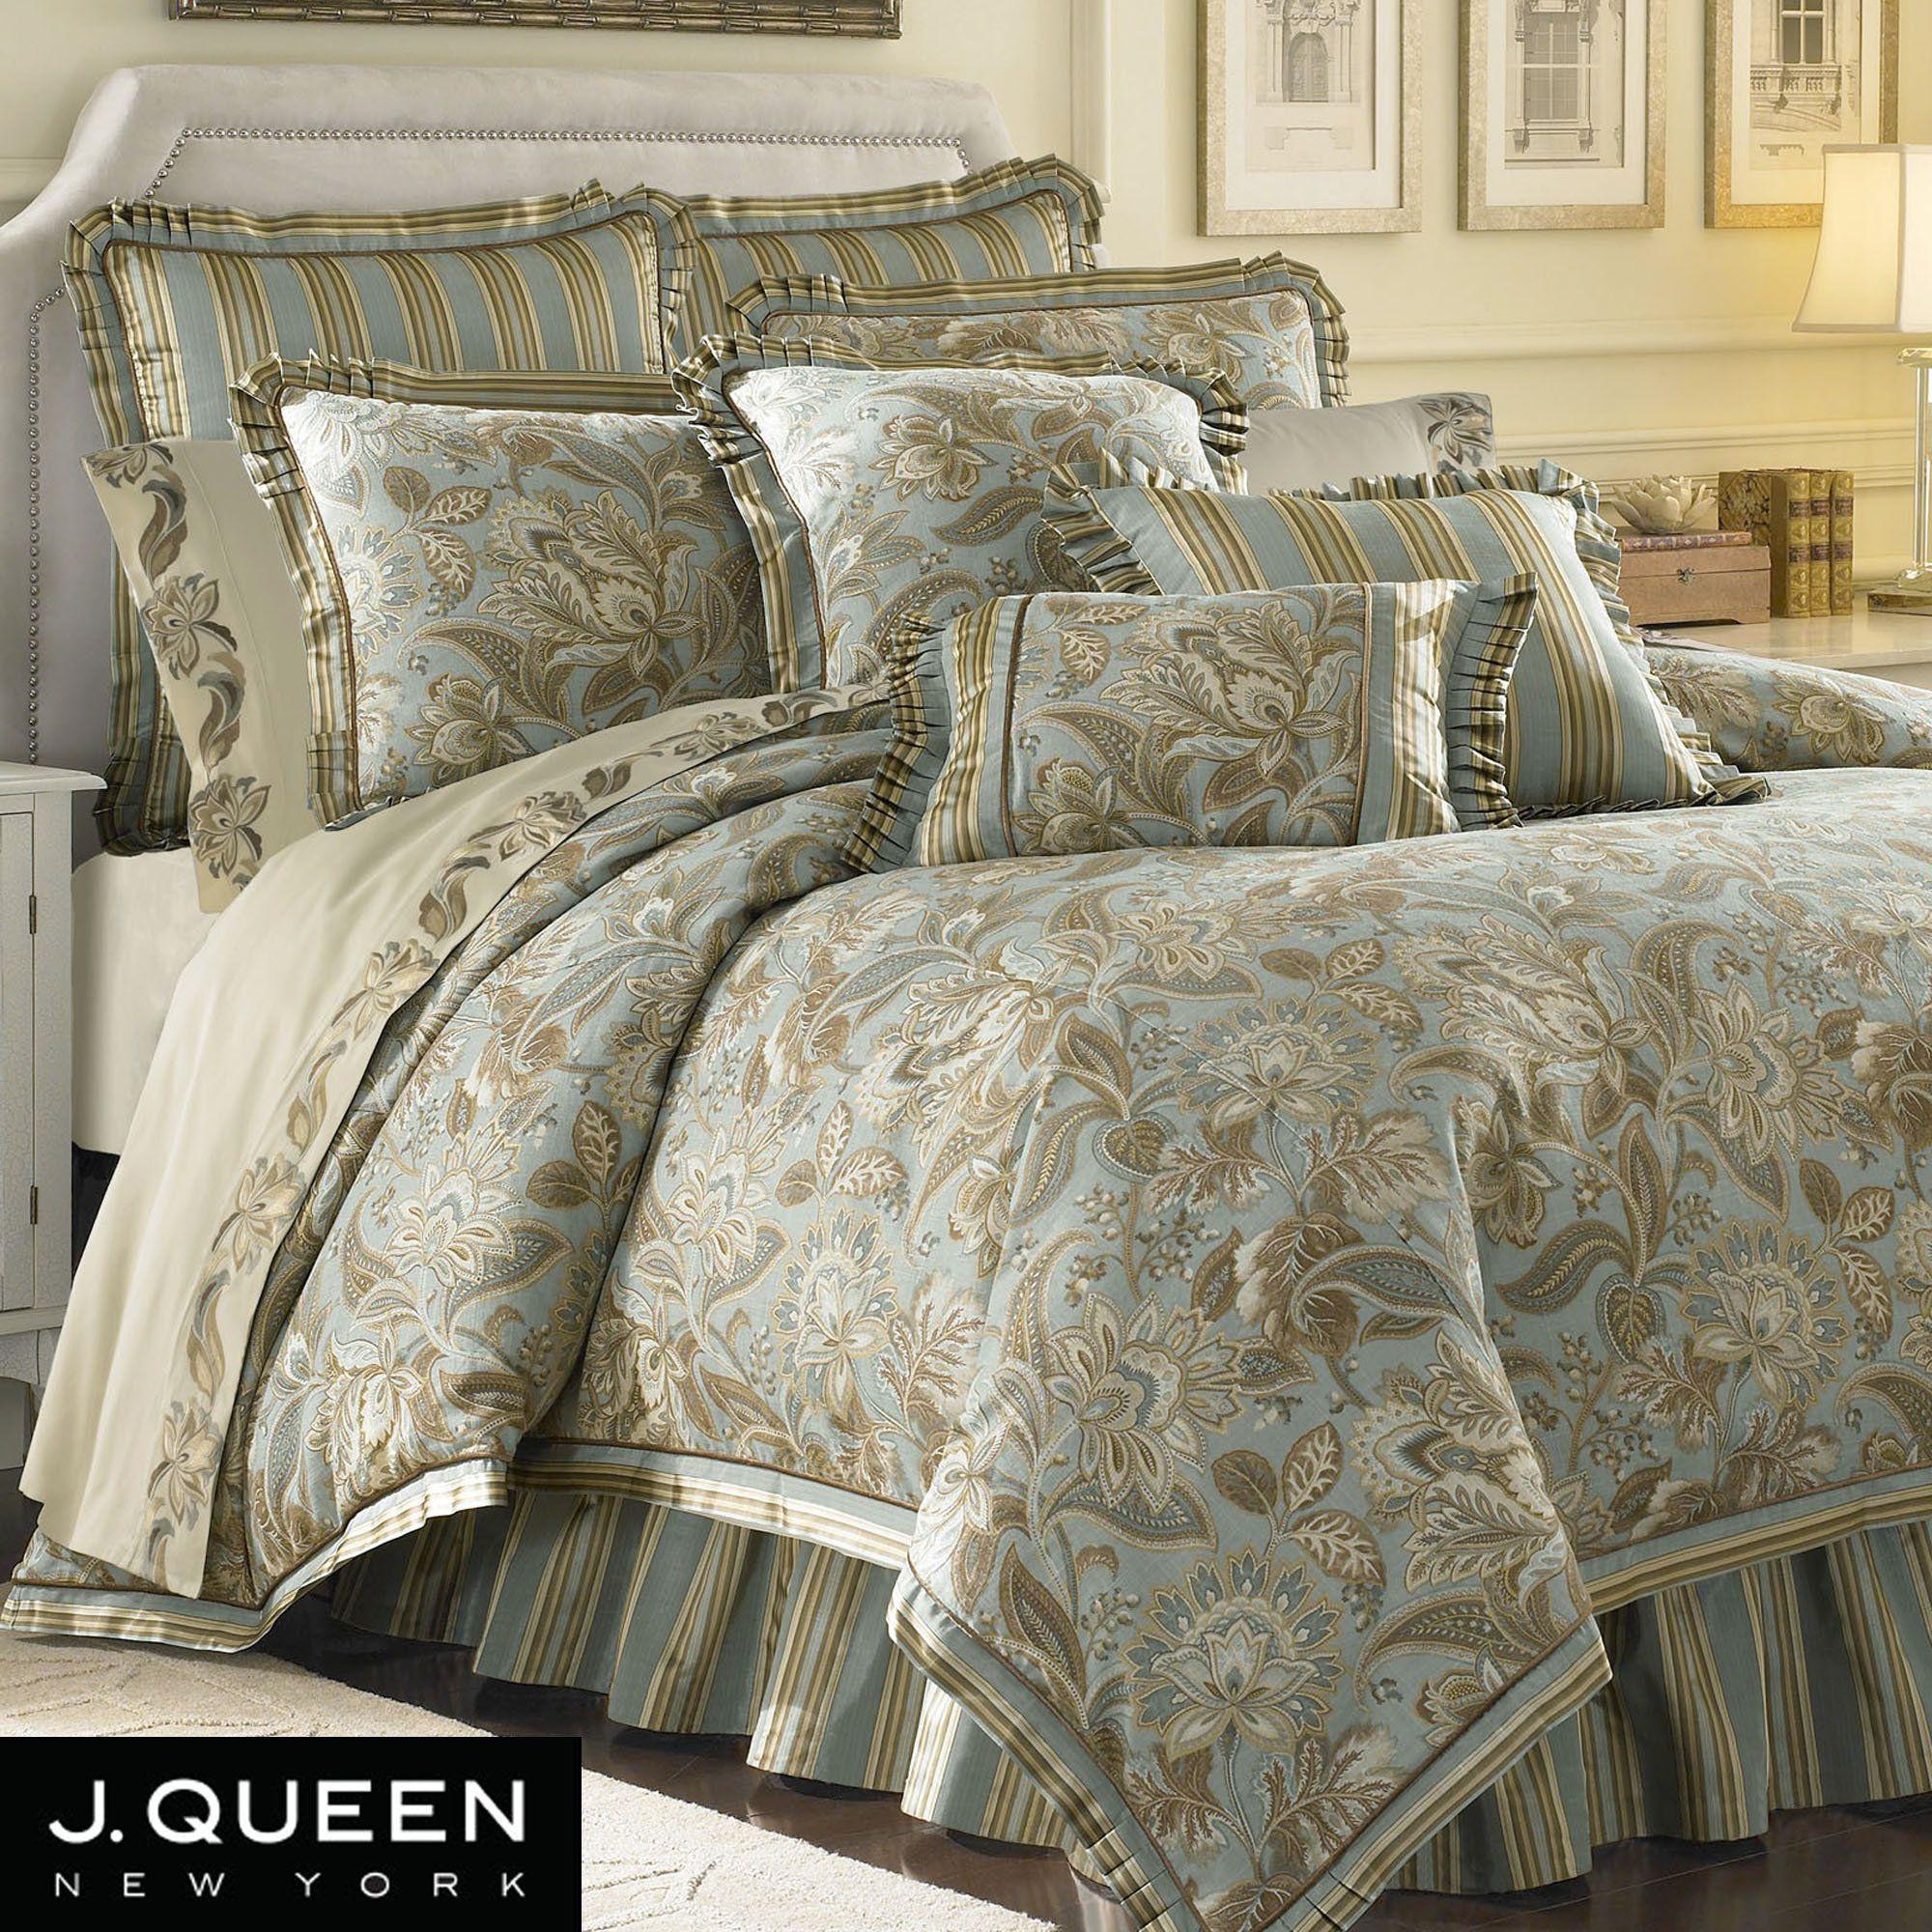 Camilla Jacobean Comforter Bedding By J Queen New York Beddings Aqua Comforter